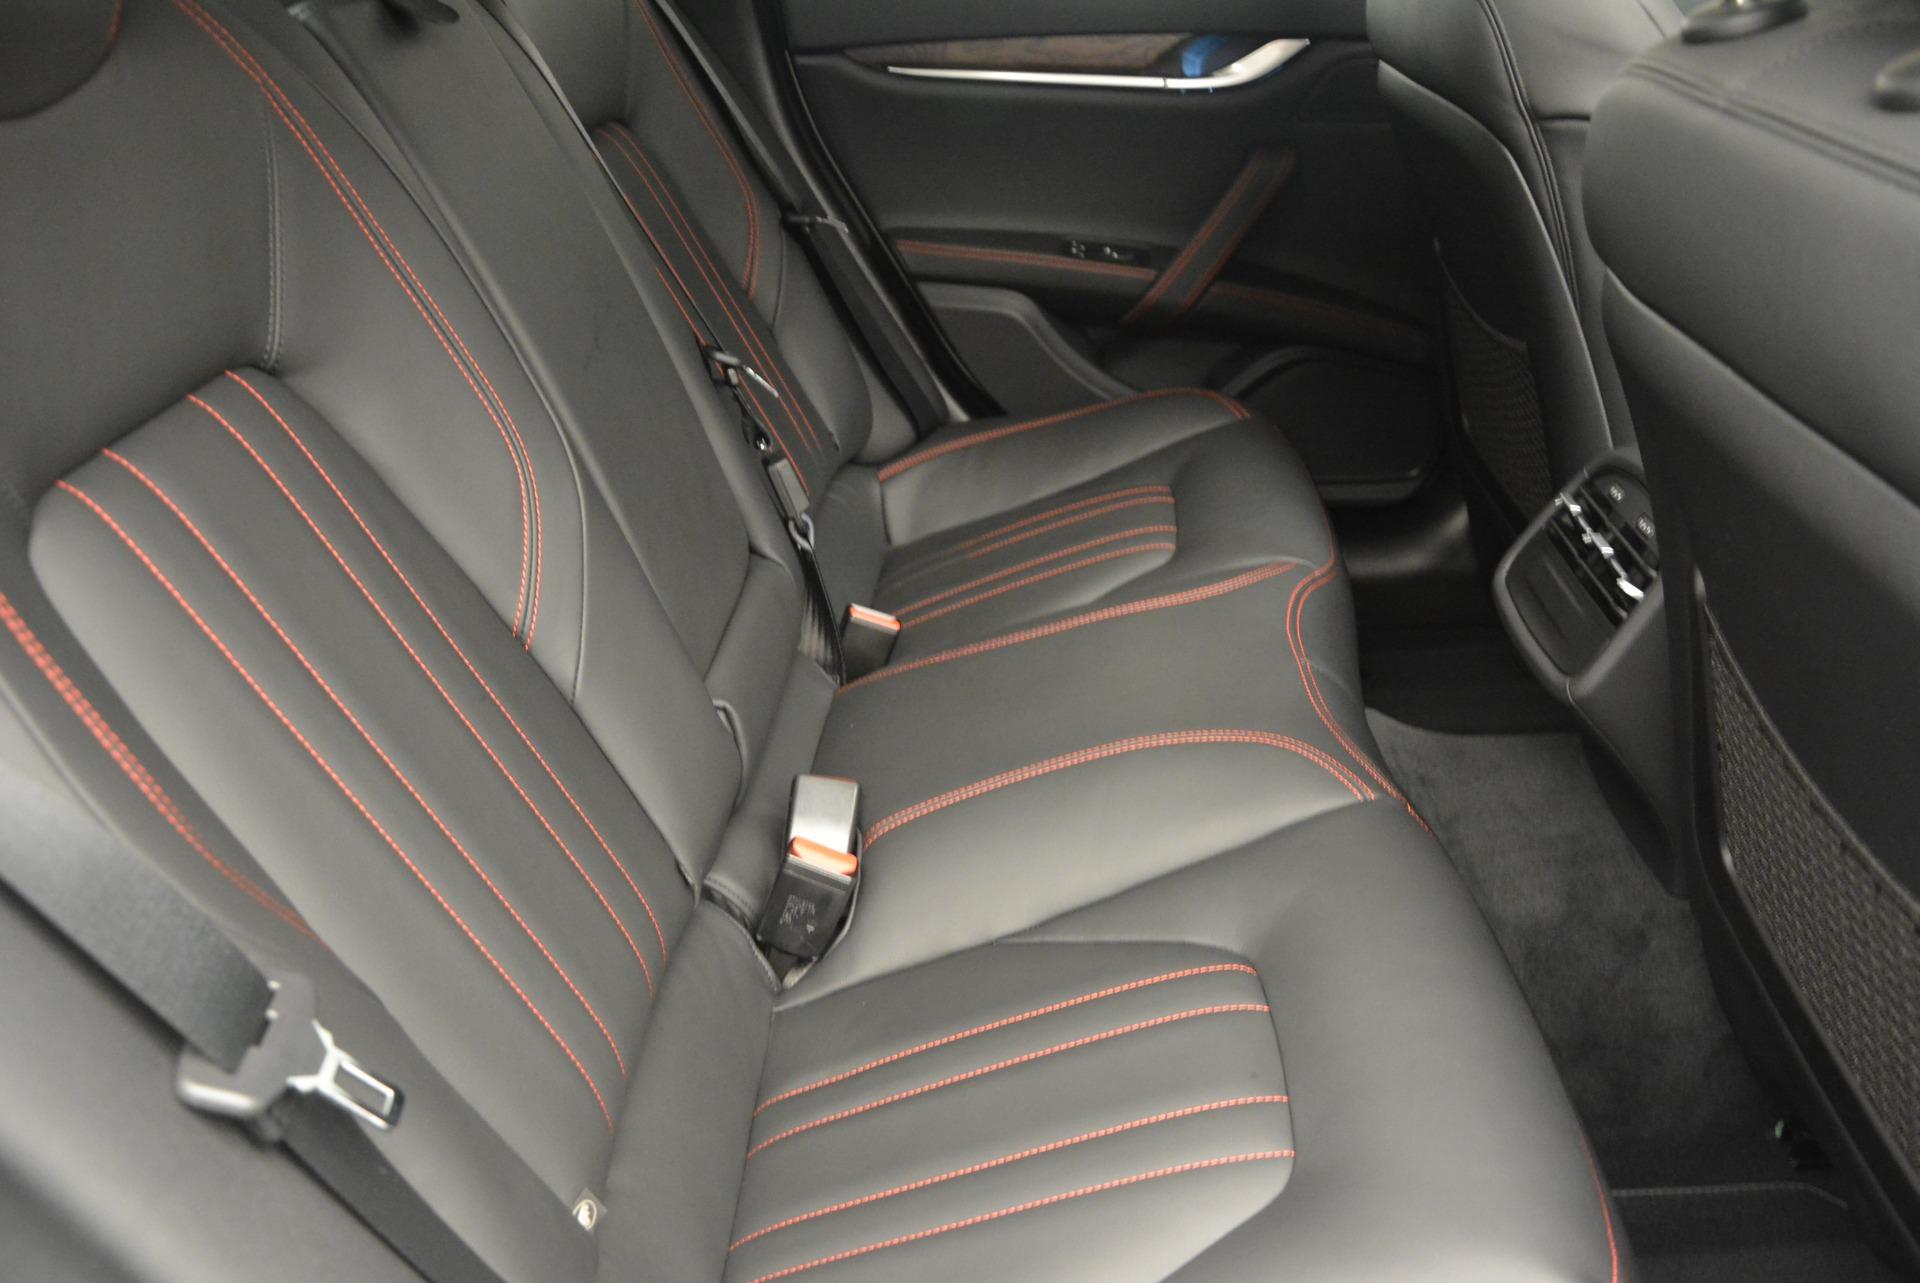 Used 2016 Maserati Ghibli S Q4  EX-LOANER For Sale In Westport, CT 669_p23